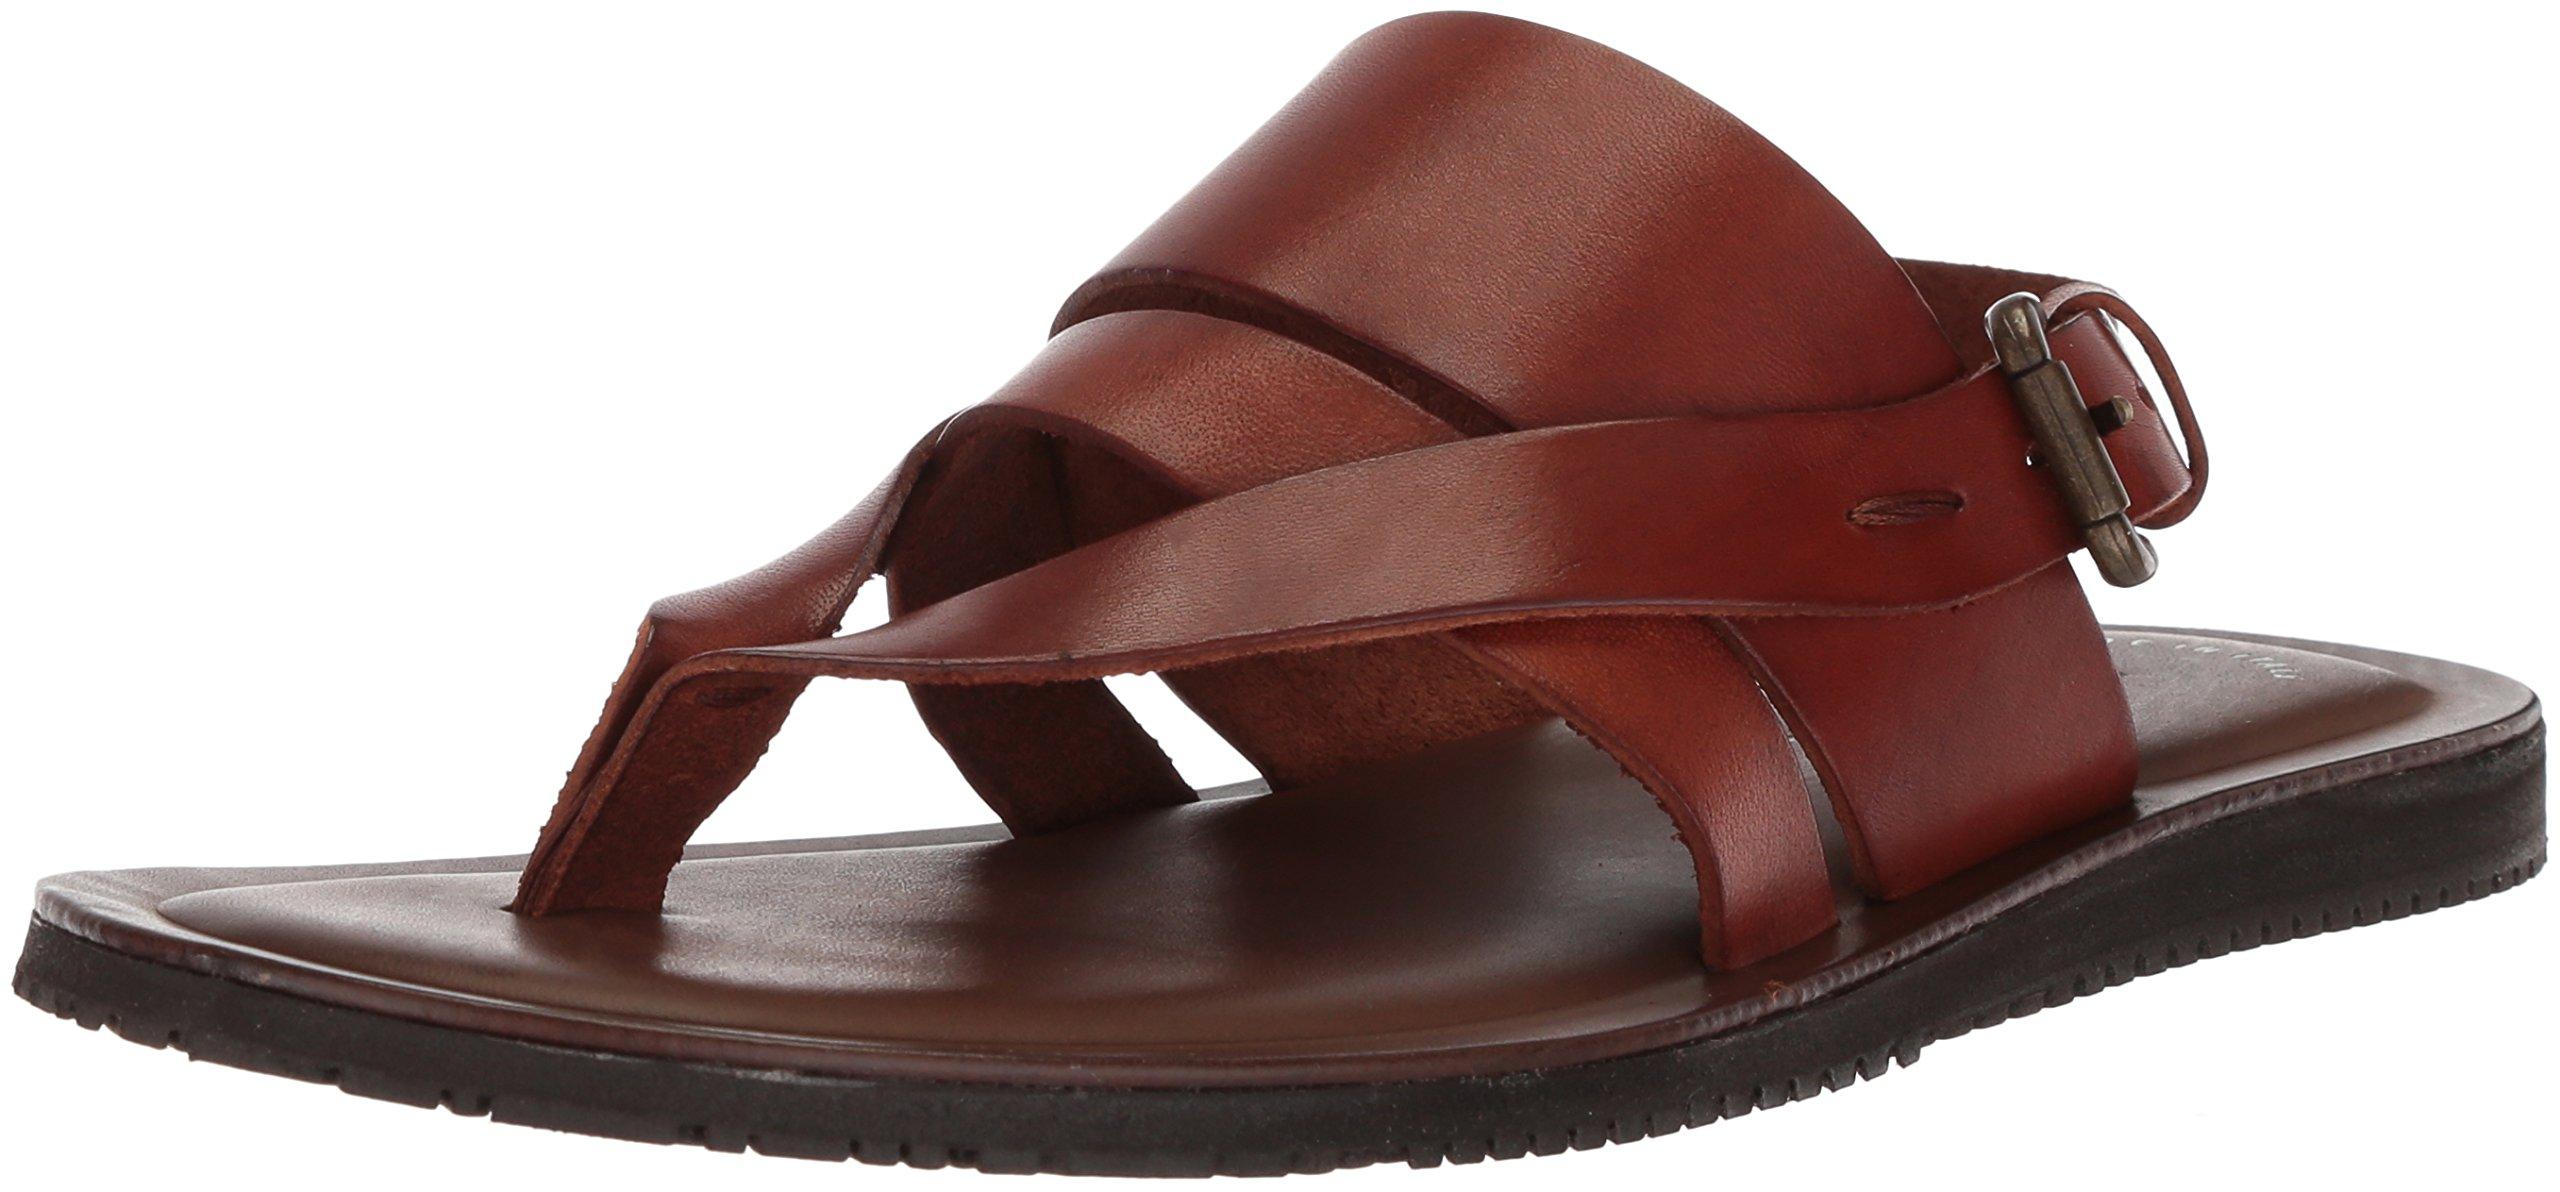 Kenneth Cole New York Men's Reel-IST Flat Sandal, Cognac, 11 M US